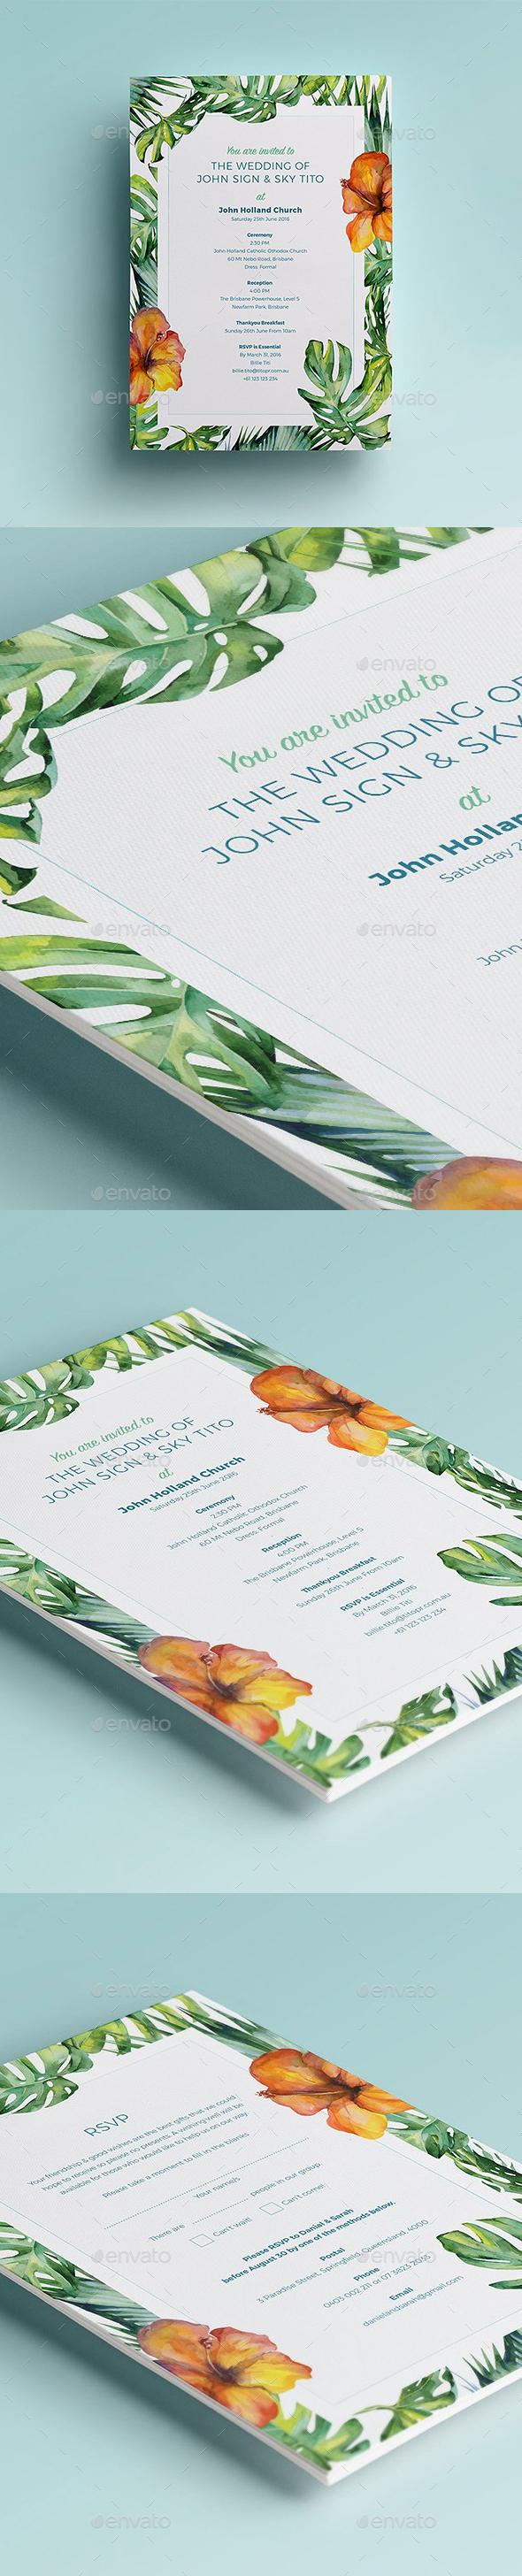 Wedding Invite - Weddings Cards & Invites